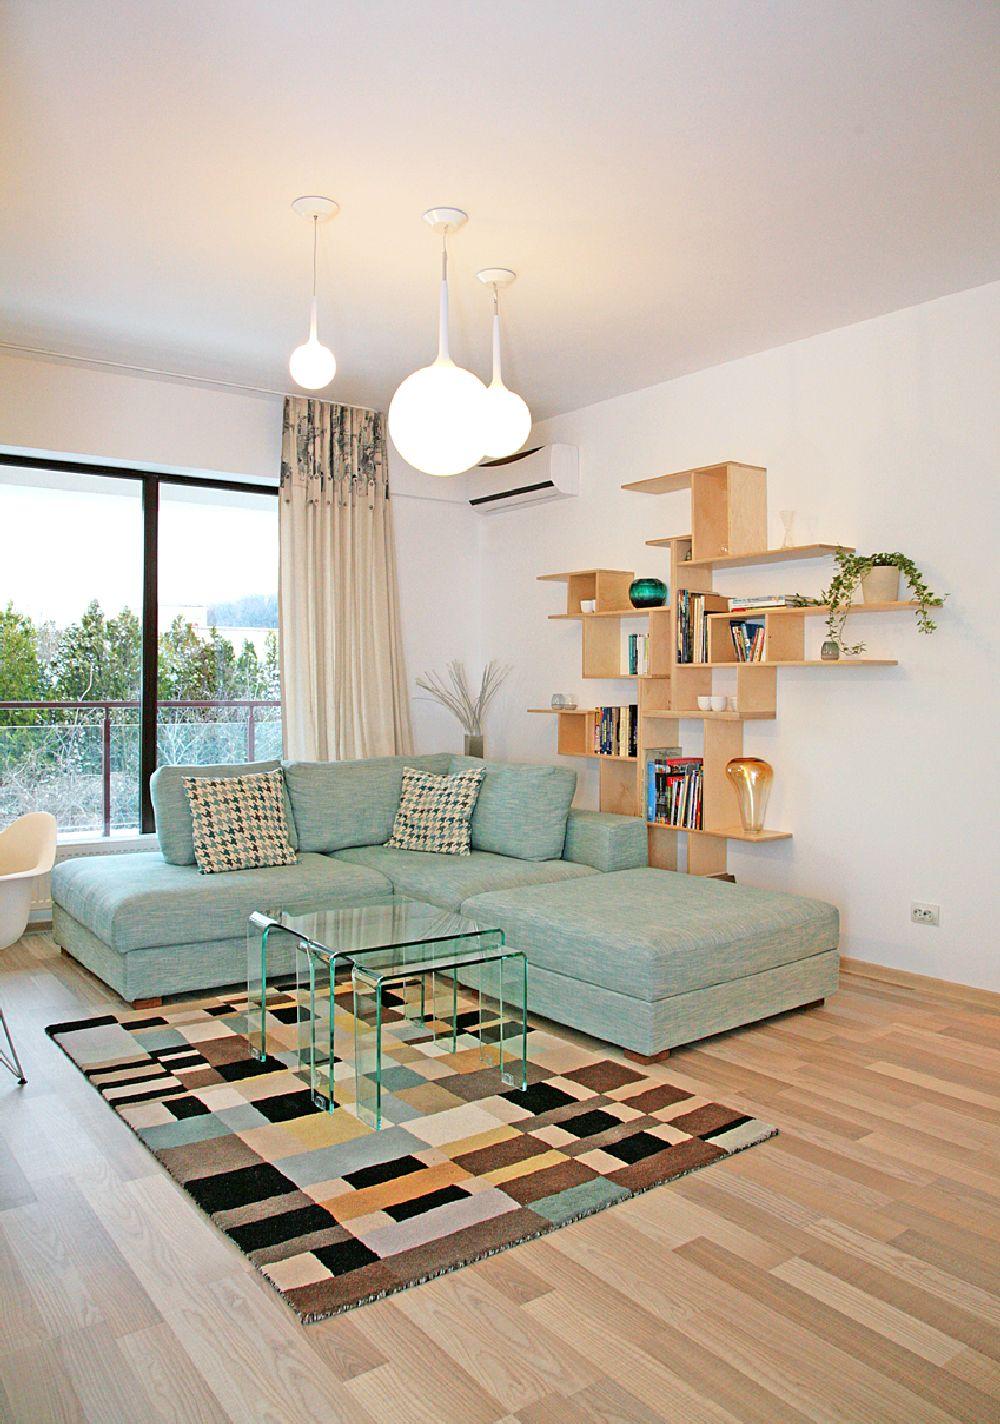 adelaparvu.com despre apartament 3 camere, 75 mp in Bucuresti, design interior Val Decor, Alia Bakutayan si Daniel Tufis, Foto Alia Bakutayan (7)